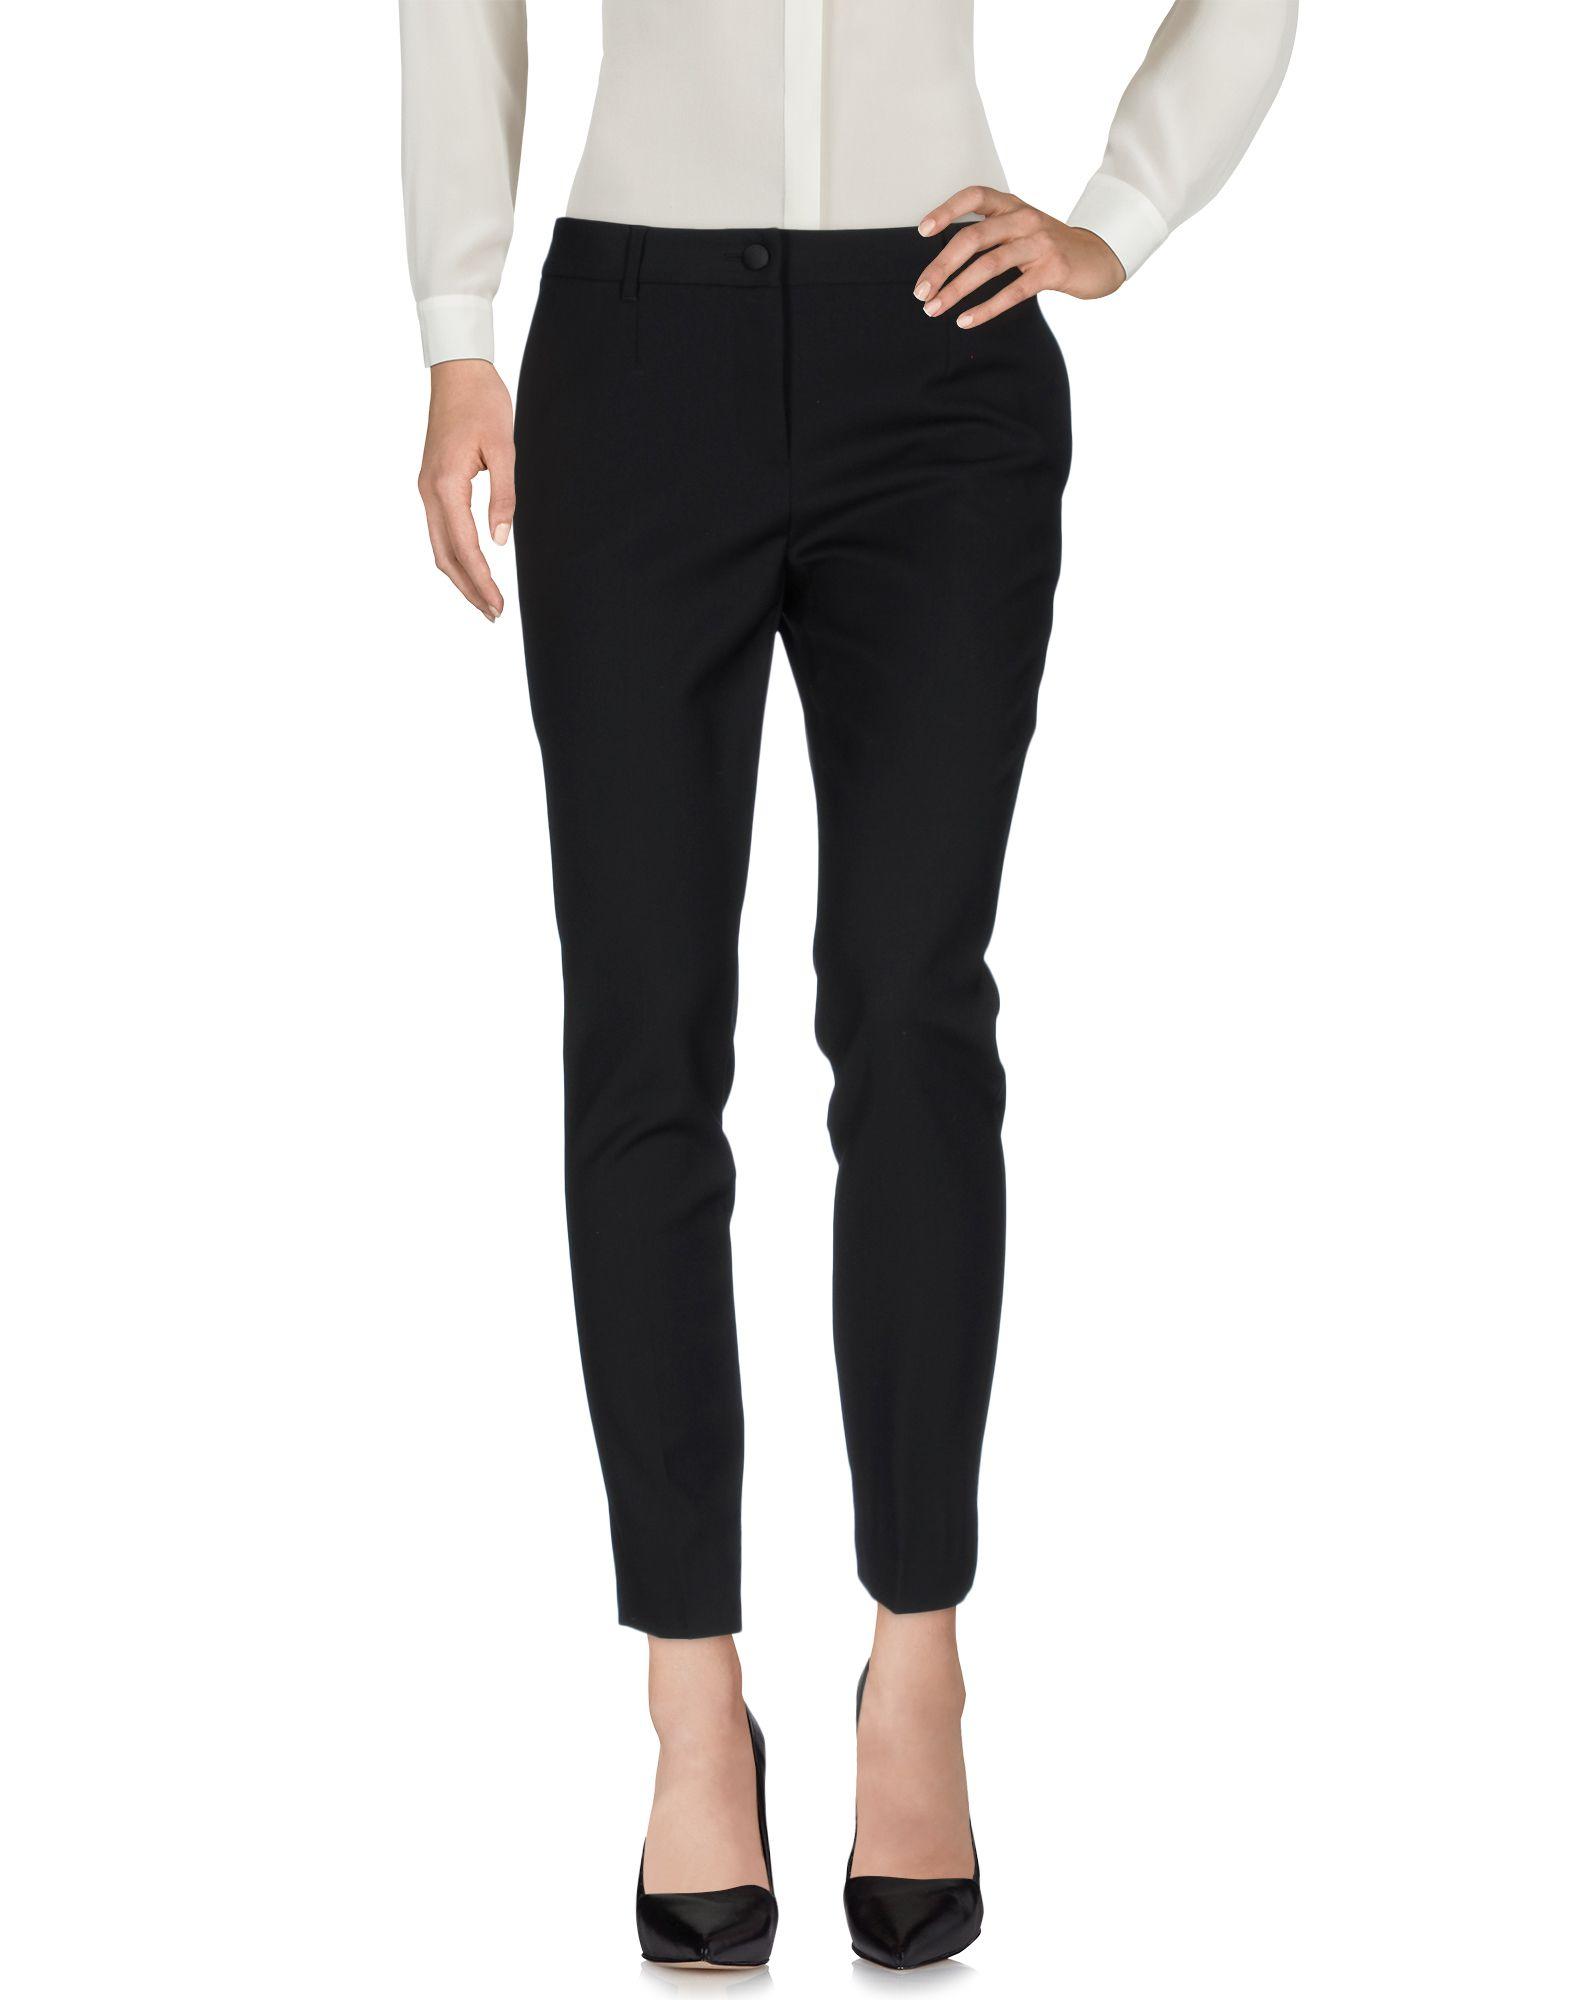 Pantalone Dolce & Gabbana Donna - Acquista online su mZbIAlQa